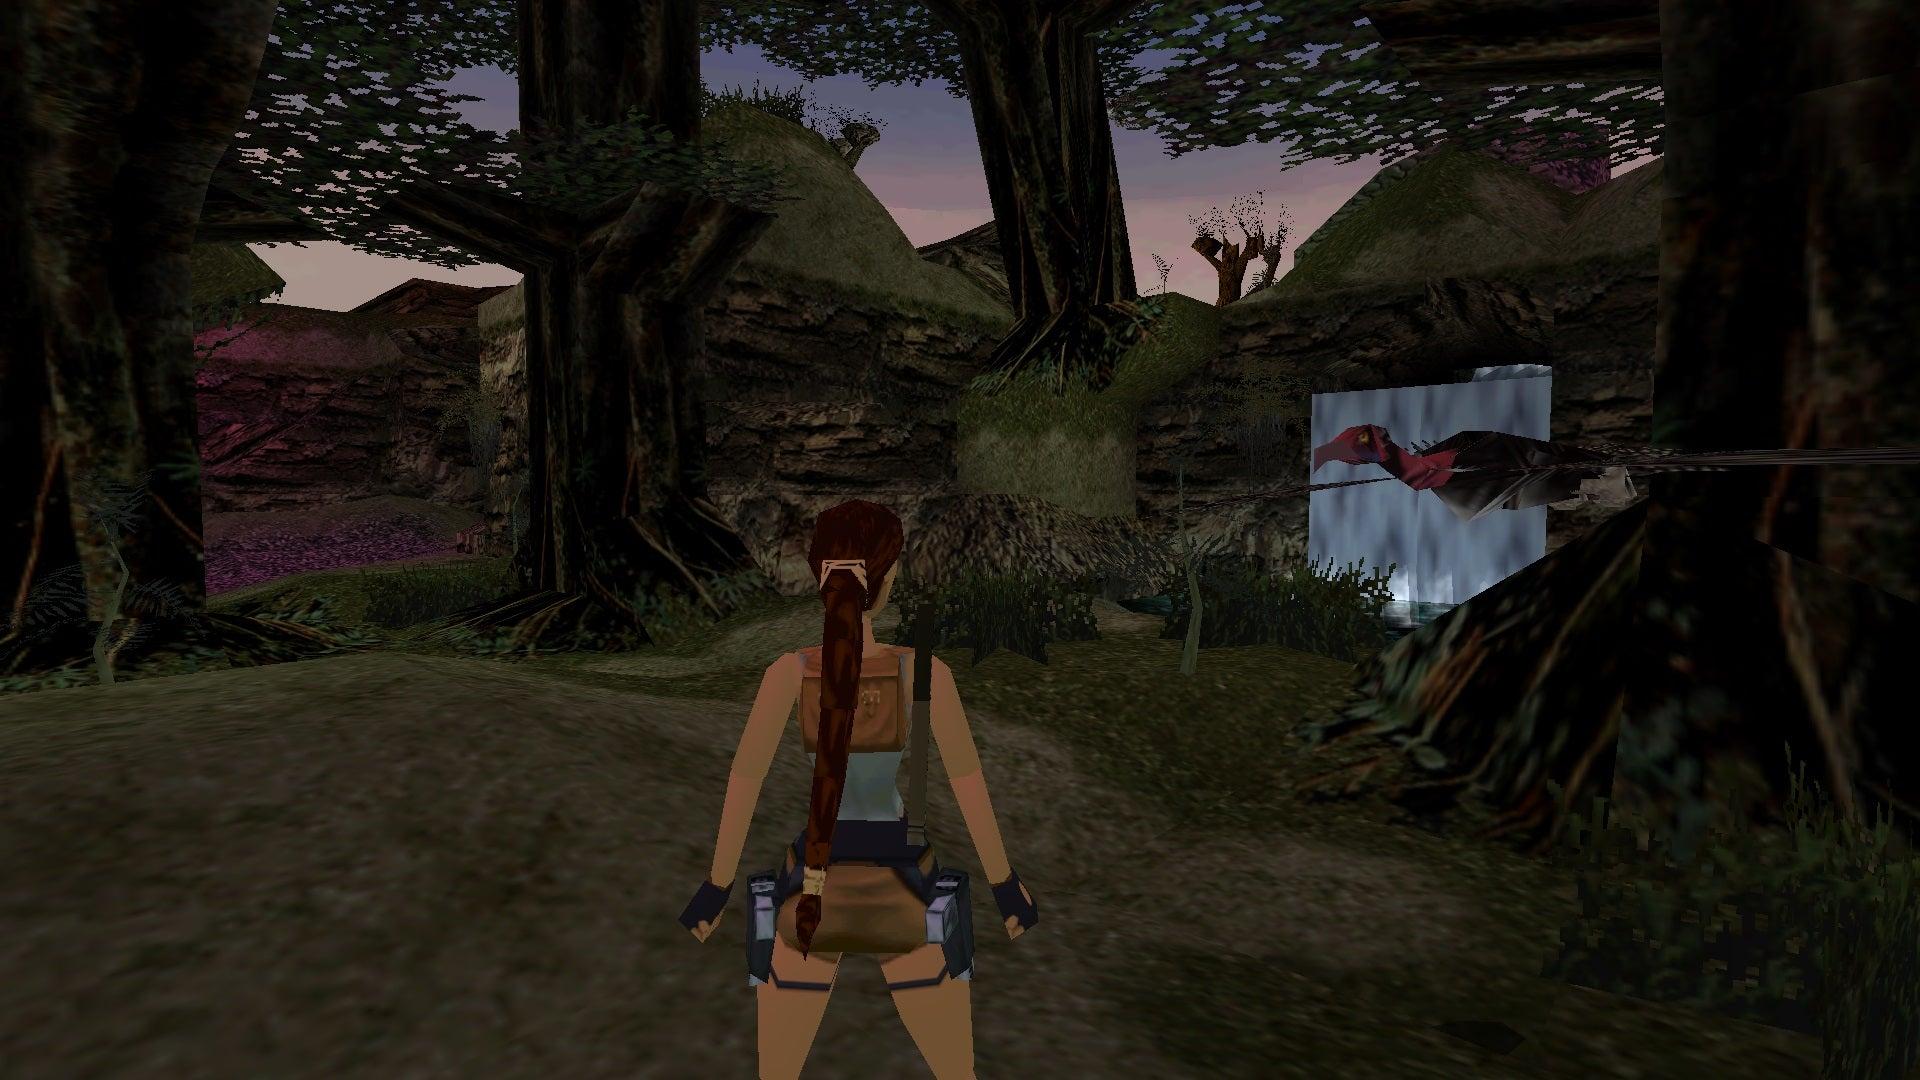 A screenshot from the Tomb Raider custom level called Tropical Island